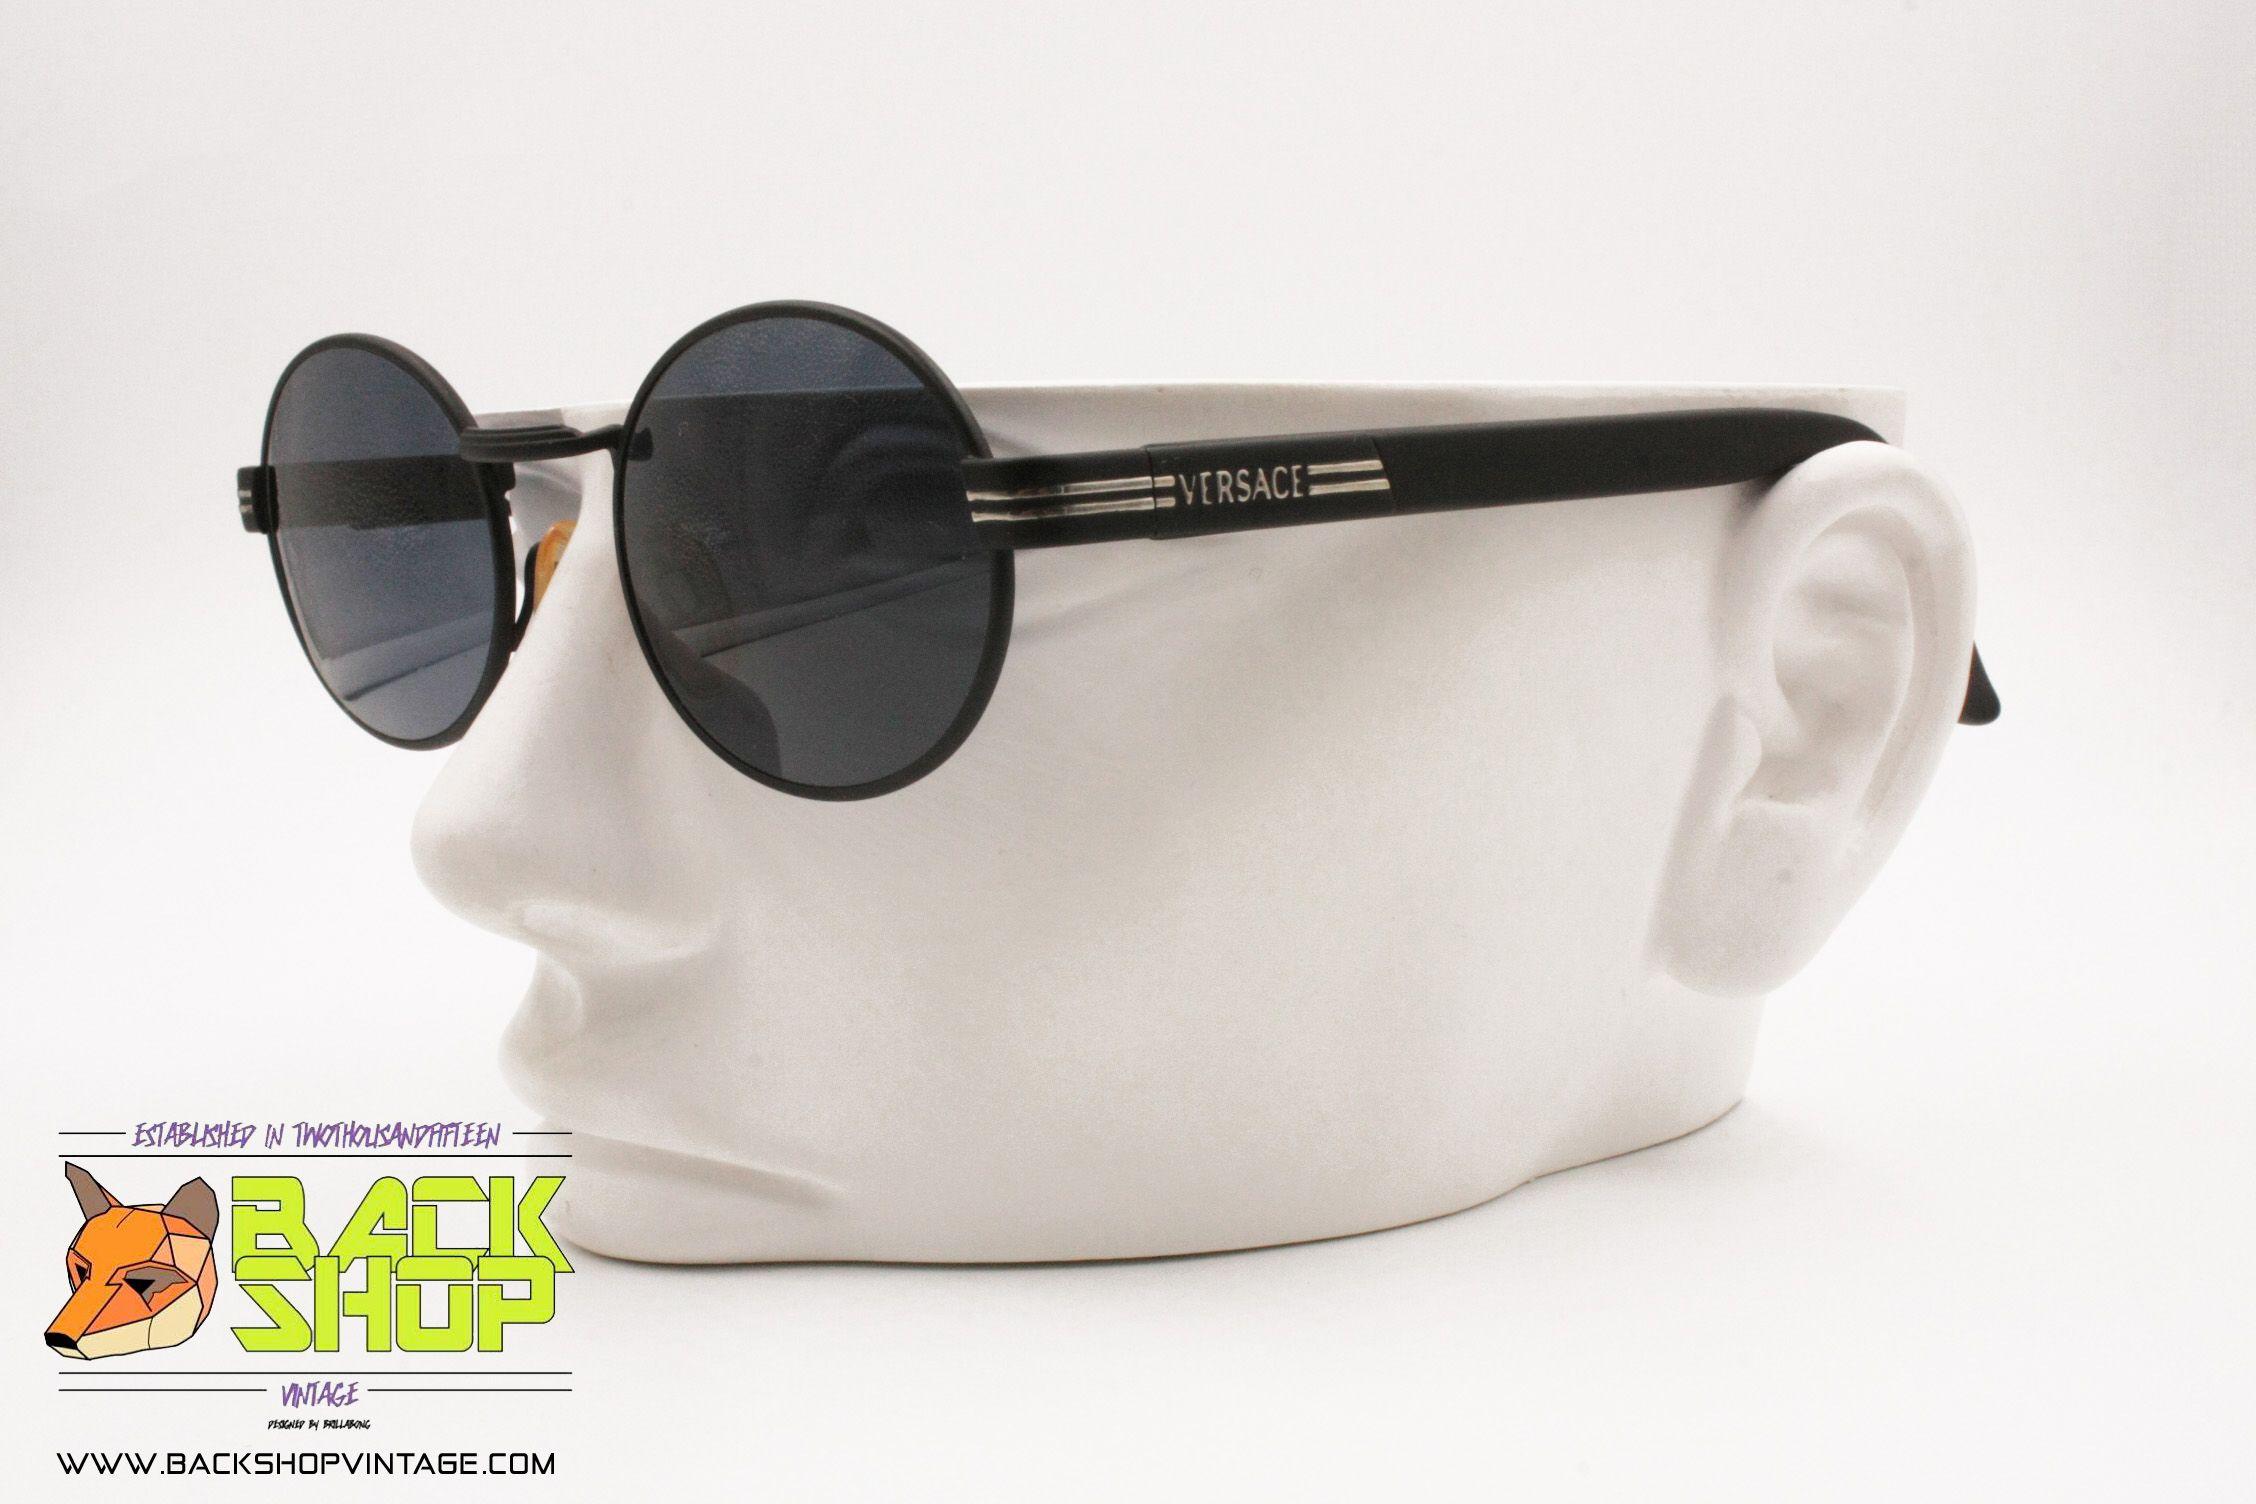 Gianni Versace Mod S85 Col 028 Vintage 90s Sunglasses Eyewear New Old Stock Sunglasses Eyewear Sunglasses Sunglasses Vintage